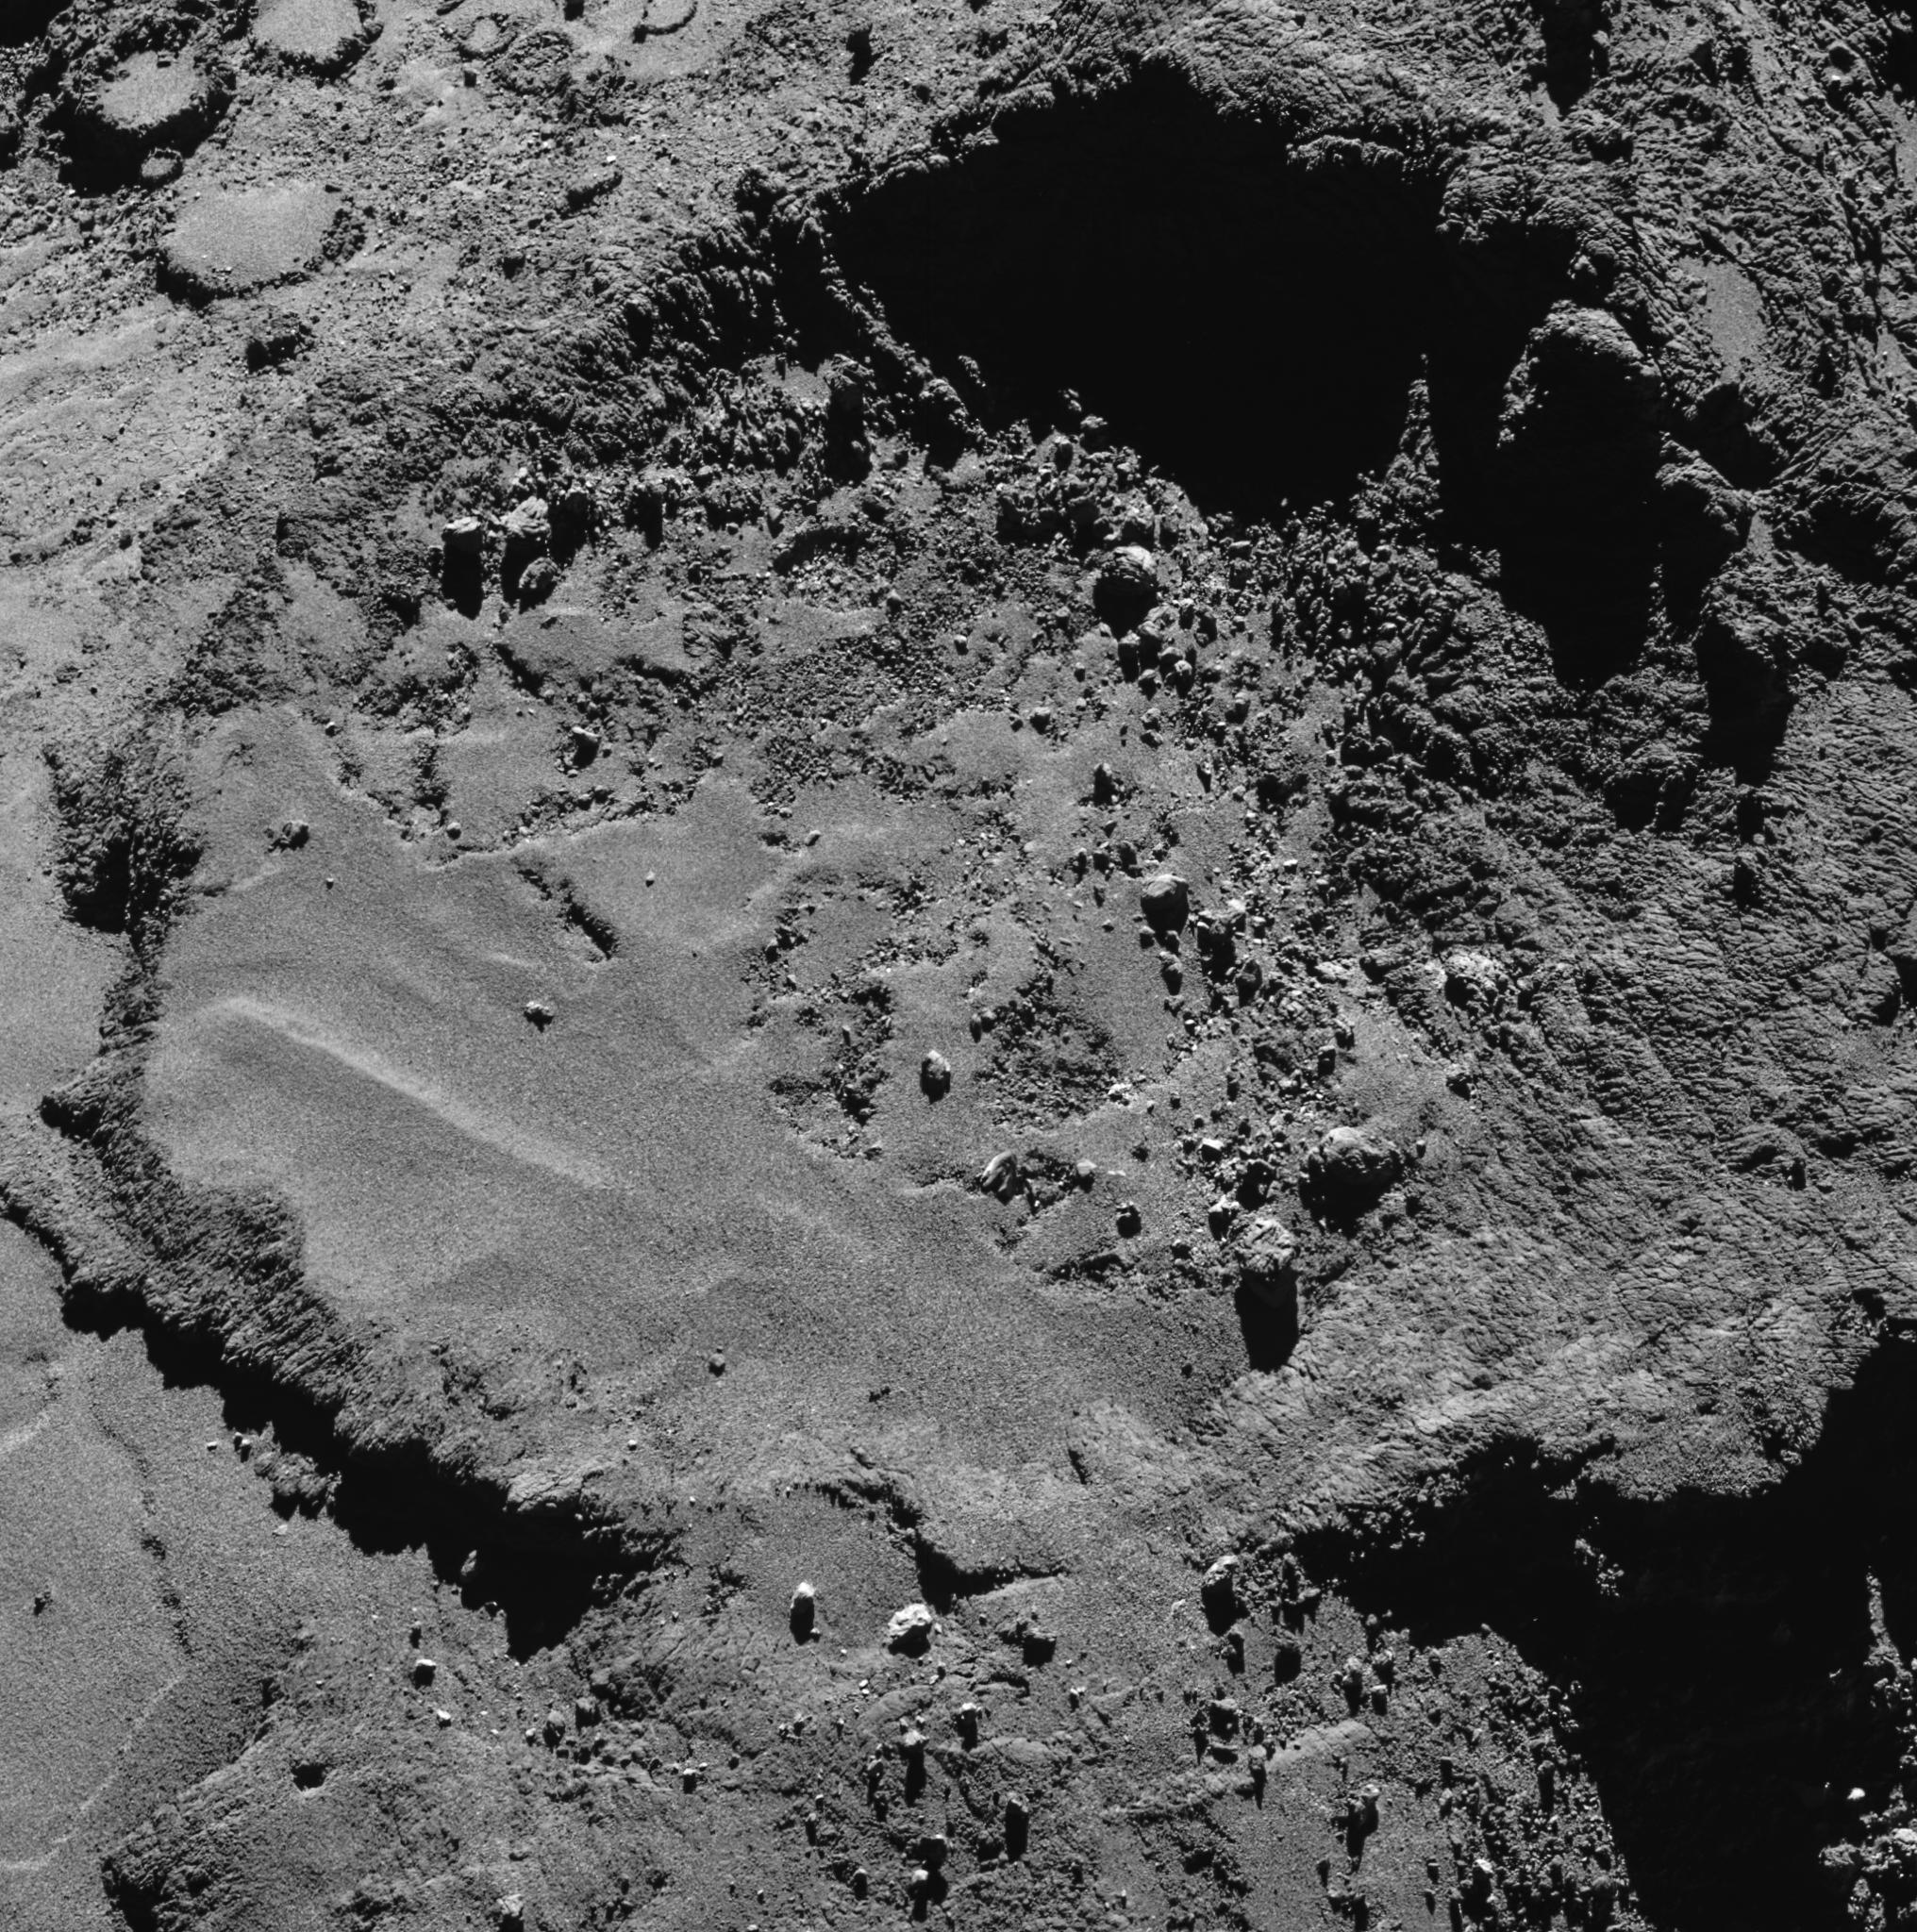 1567215175528-ESA_Rosetta_OSIRIS_NAC_Plume_20160503_crop.png